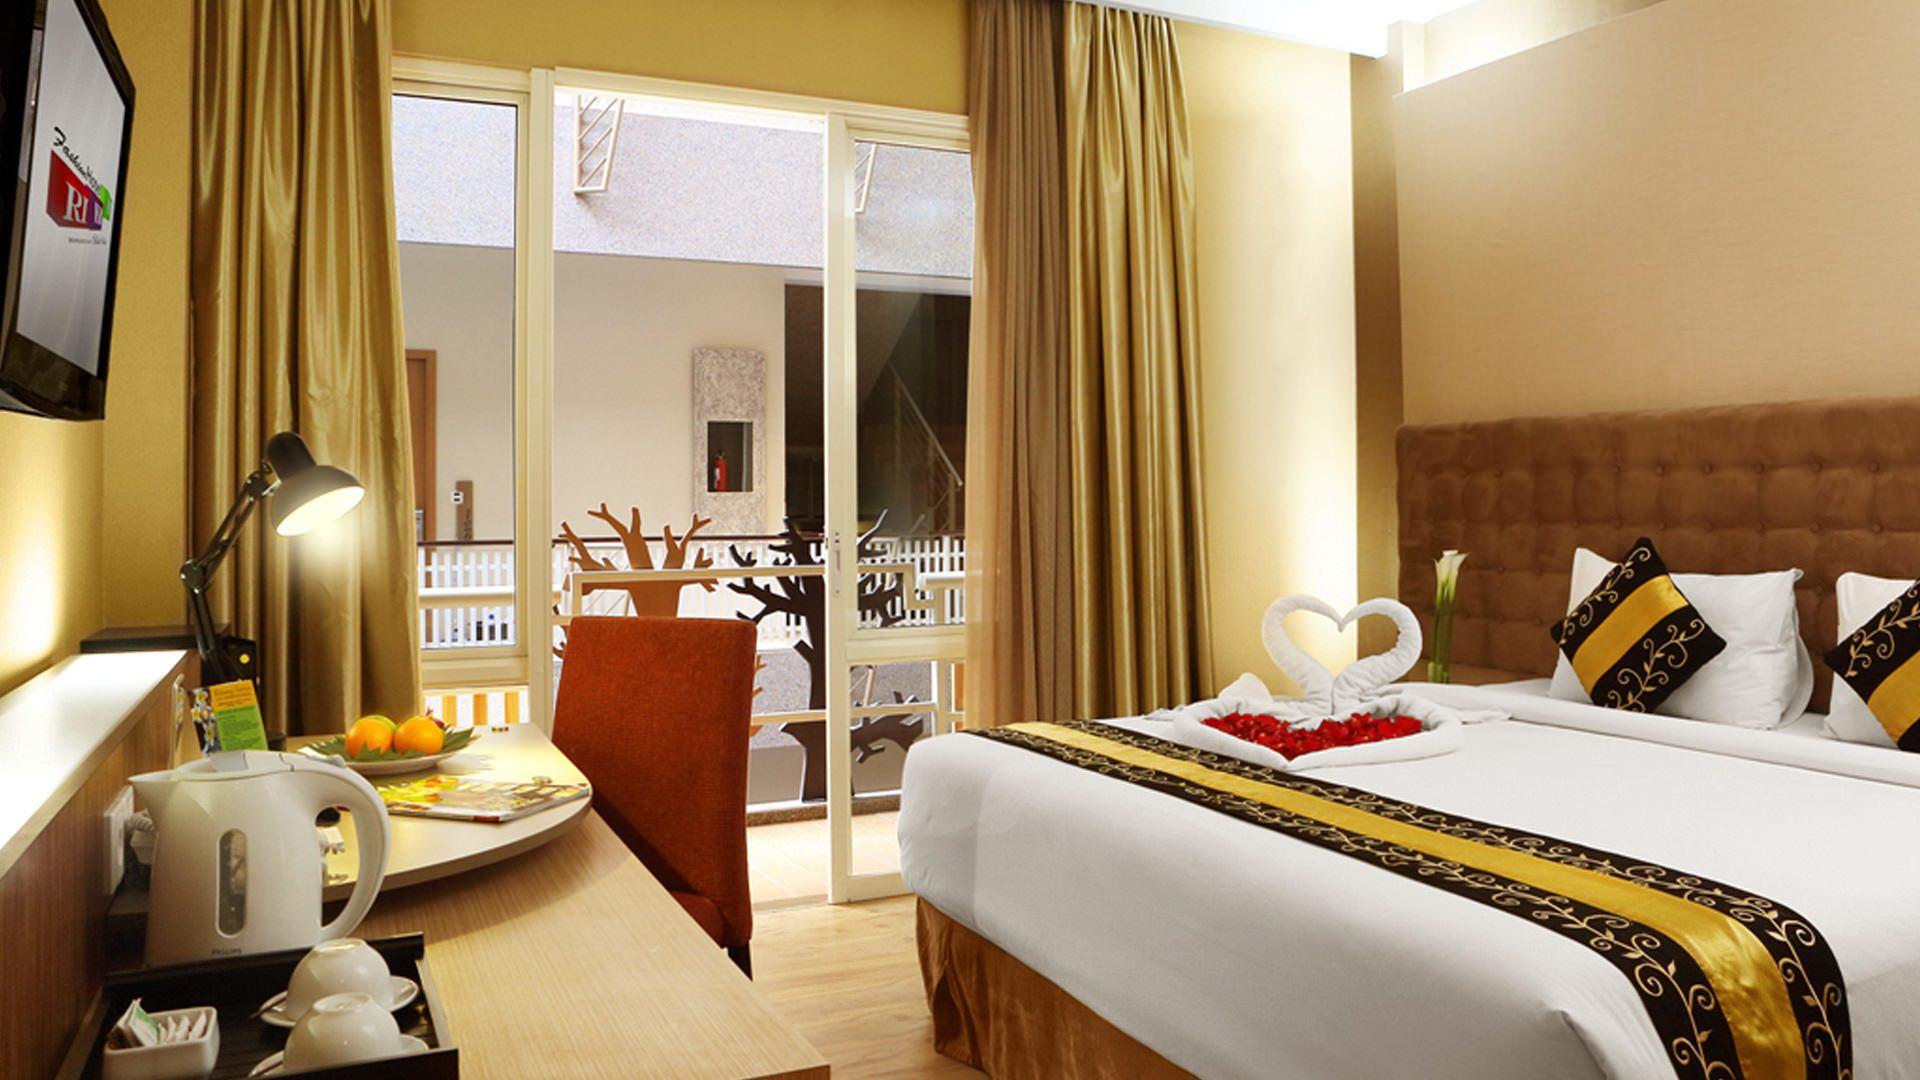 Paket Honeymoon Bali 4 Hari 3 Malam Murah